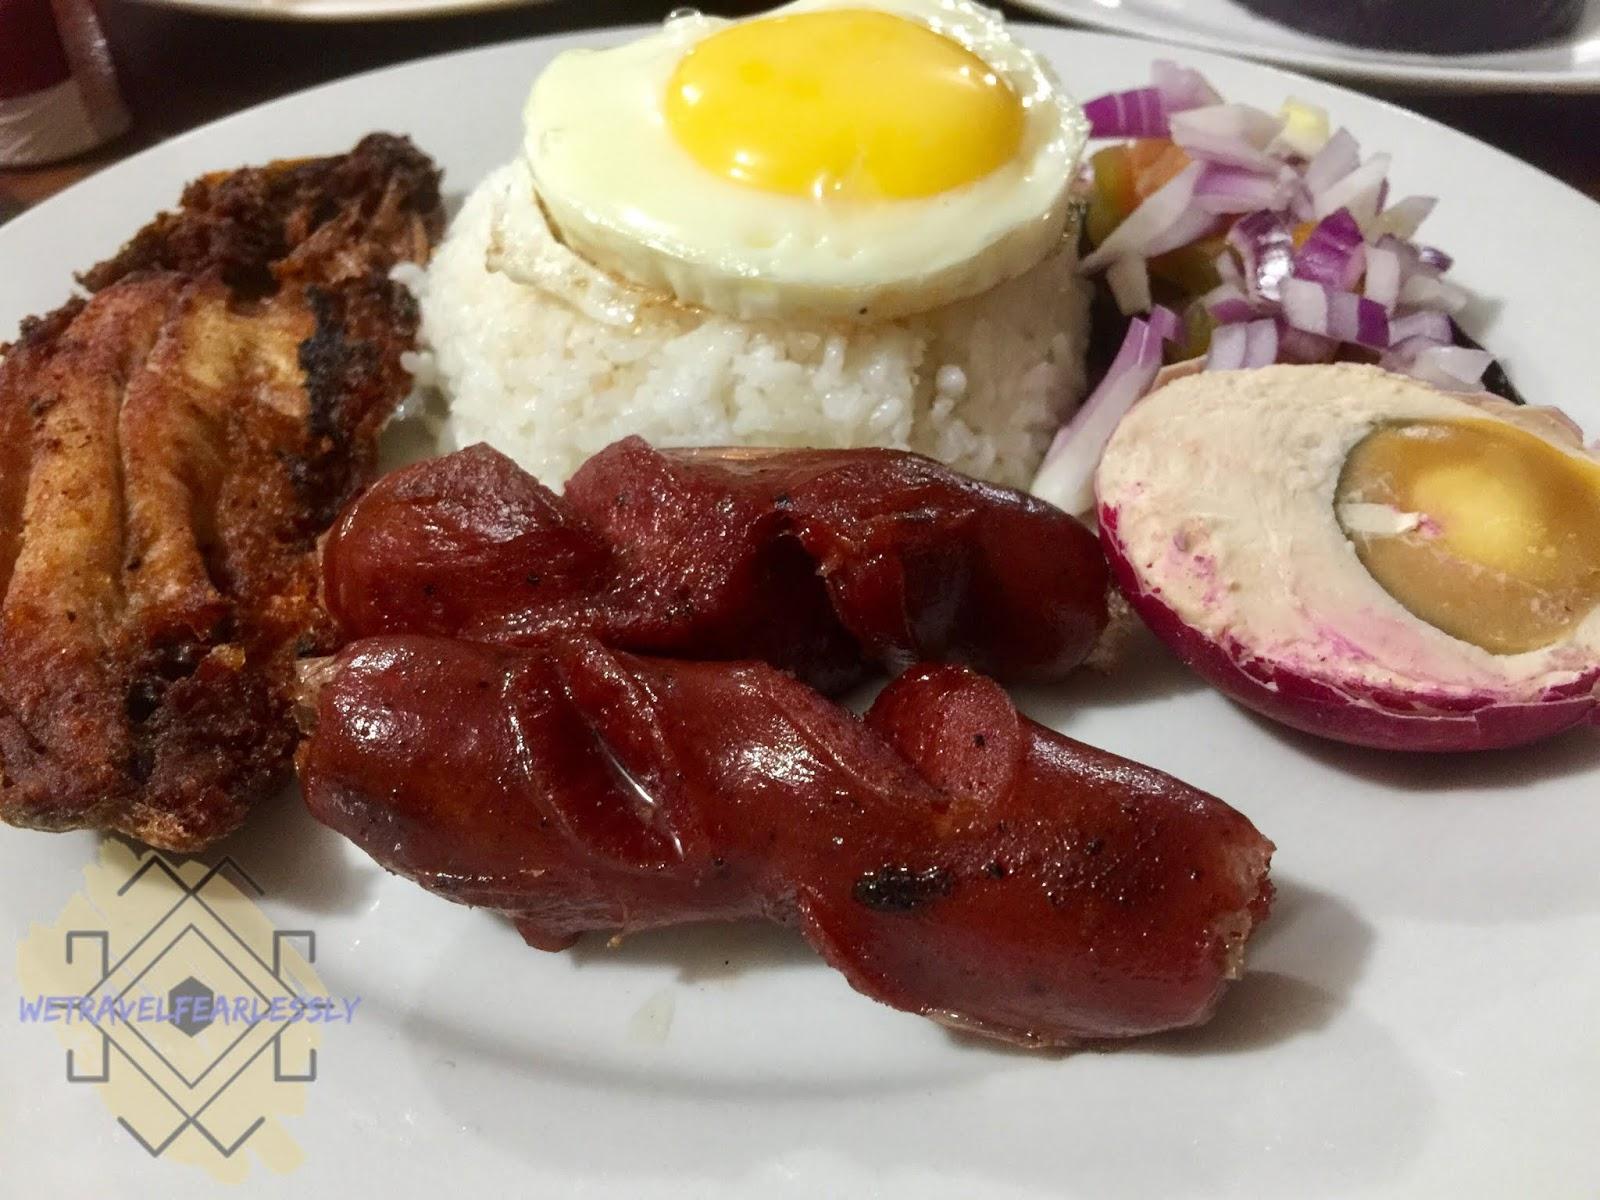 Tuki's Big Meal - Daing na Bangus and Sweet and Spicy Longganisa (PHP109) in Tuki's Food Station in Manggahan, Pasig